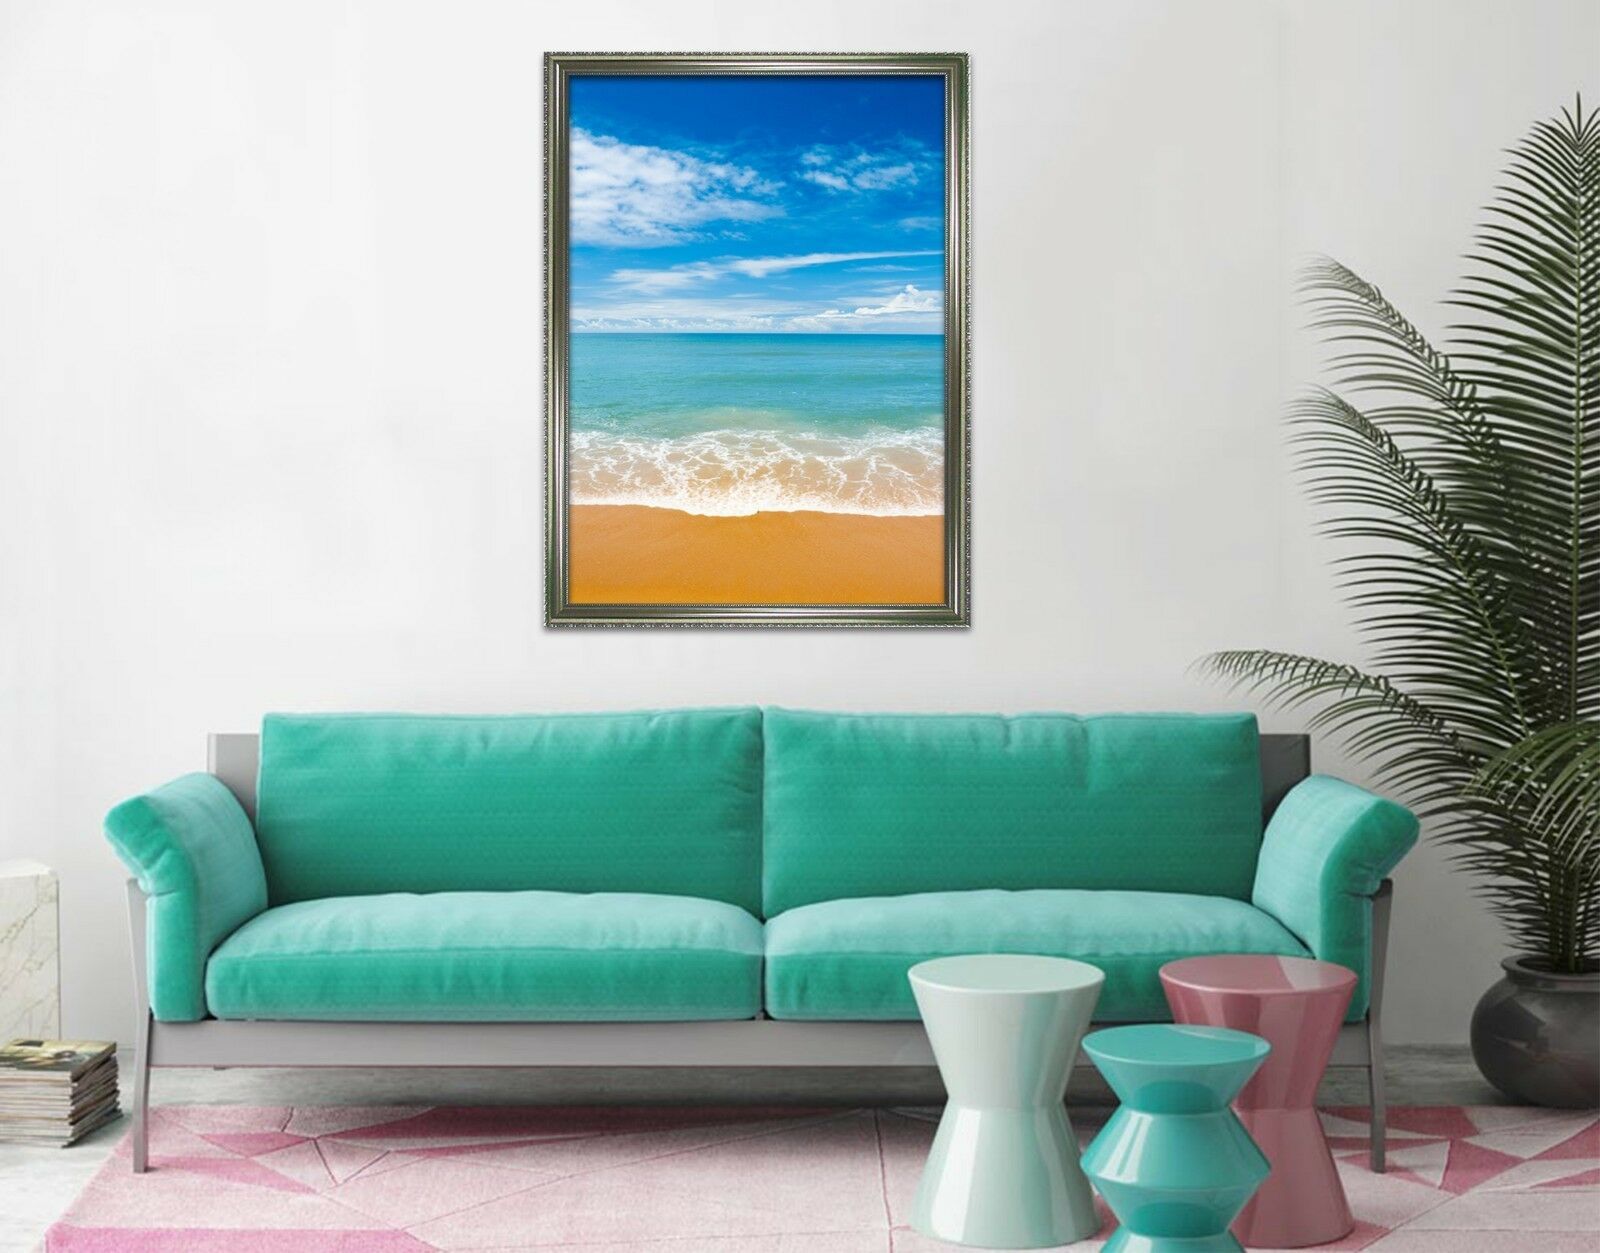 3D Blau Sky Beach 675 Fake Framed Poster Home Decor Drucken Painting Unique Kunst